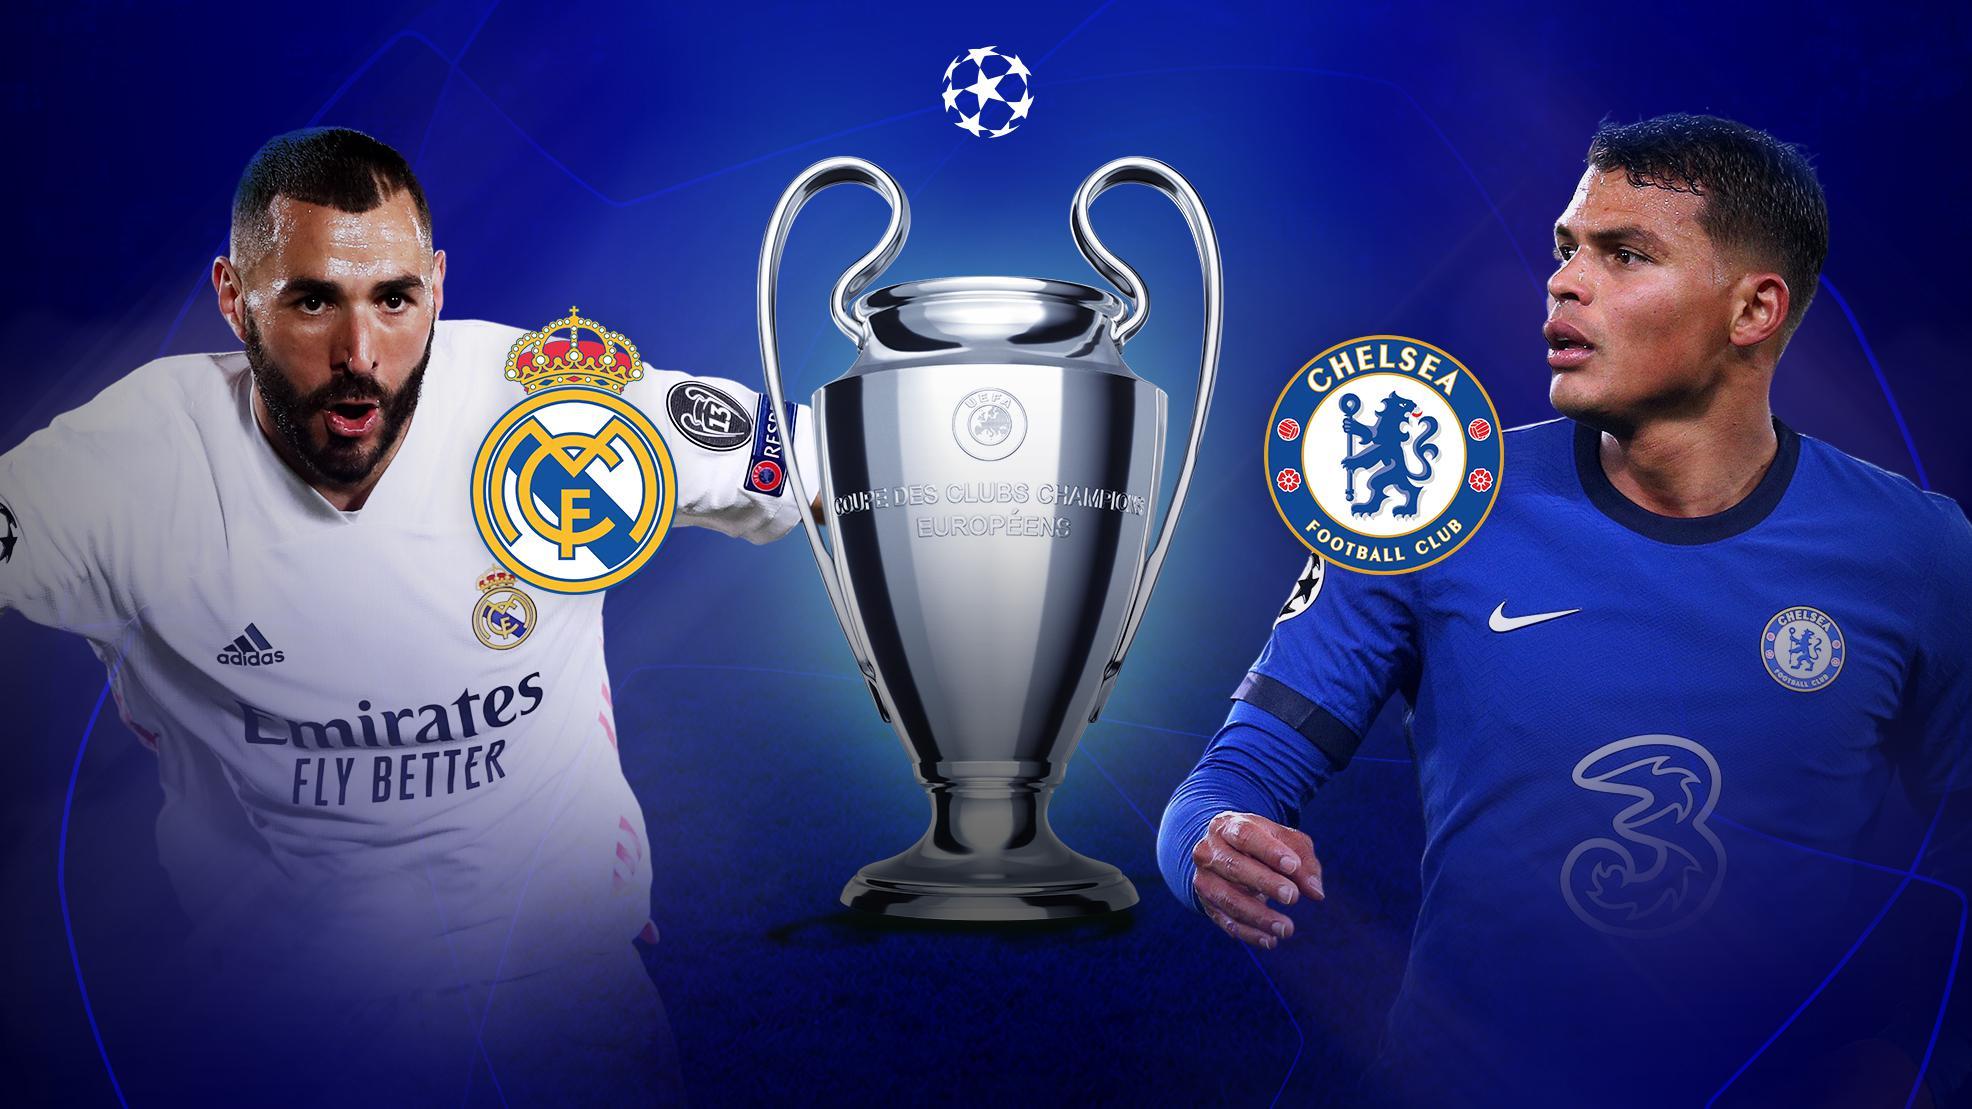 chelsea, real madrid, بث مباشر ريال مدريد و تشيلسي, تشيلسي, ريال مدريد, مباراة ريال مدريد وتشيلسي, مشاهدة مباراة ريال مدريد وتشيلسي